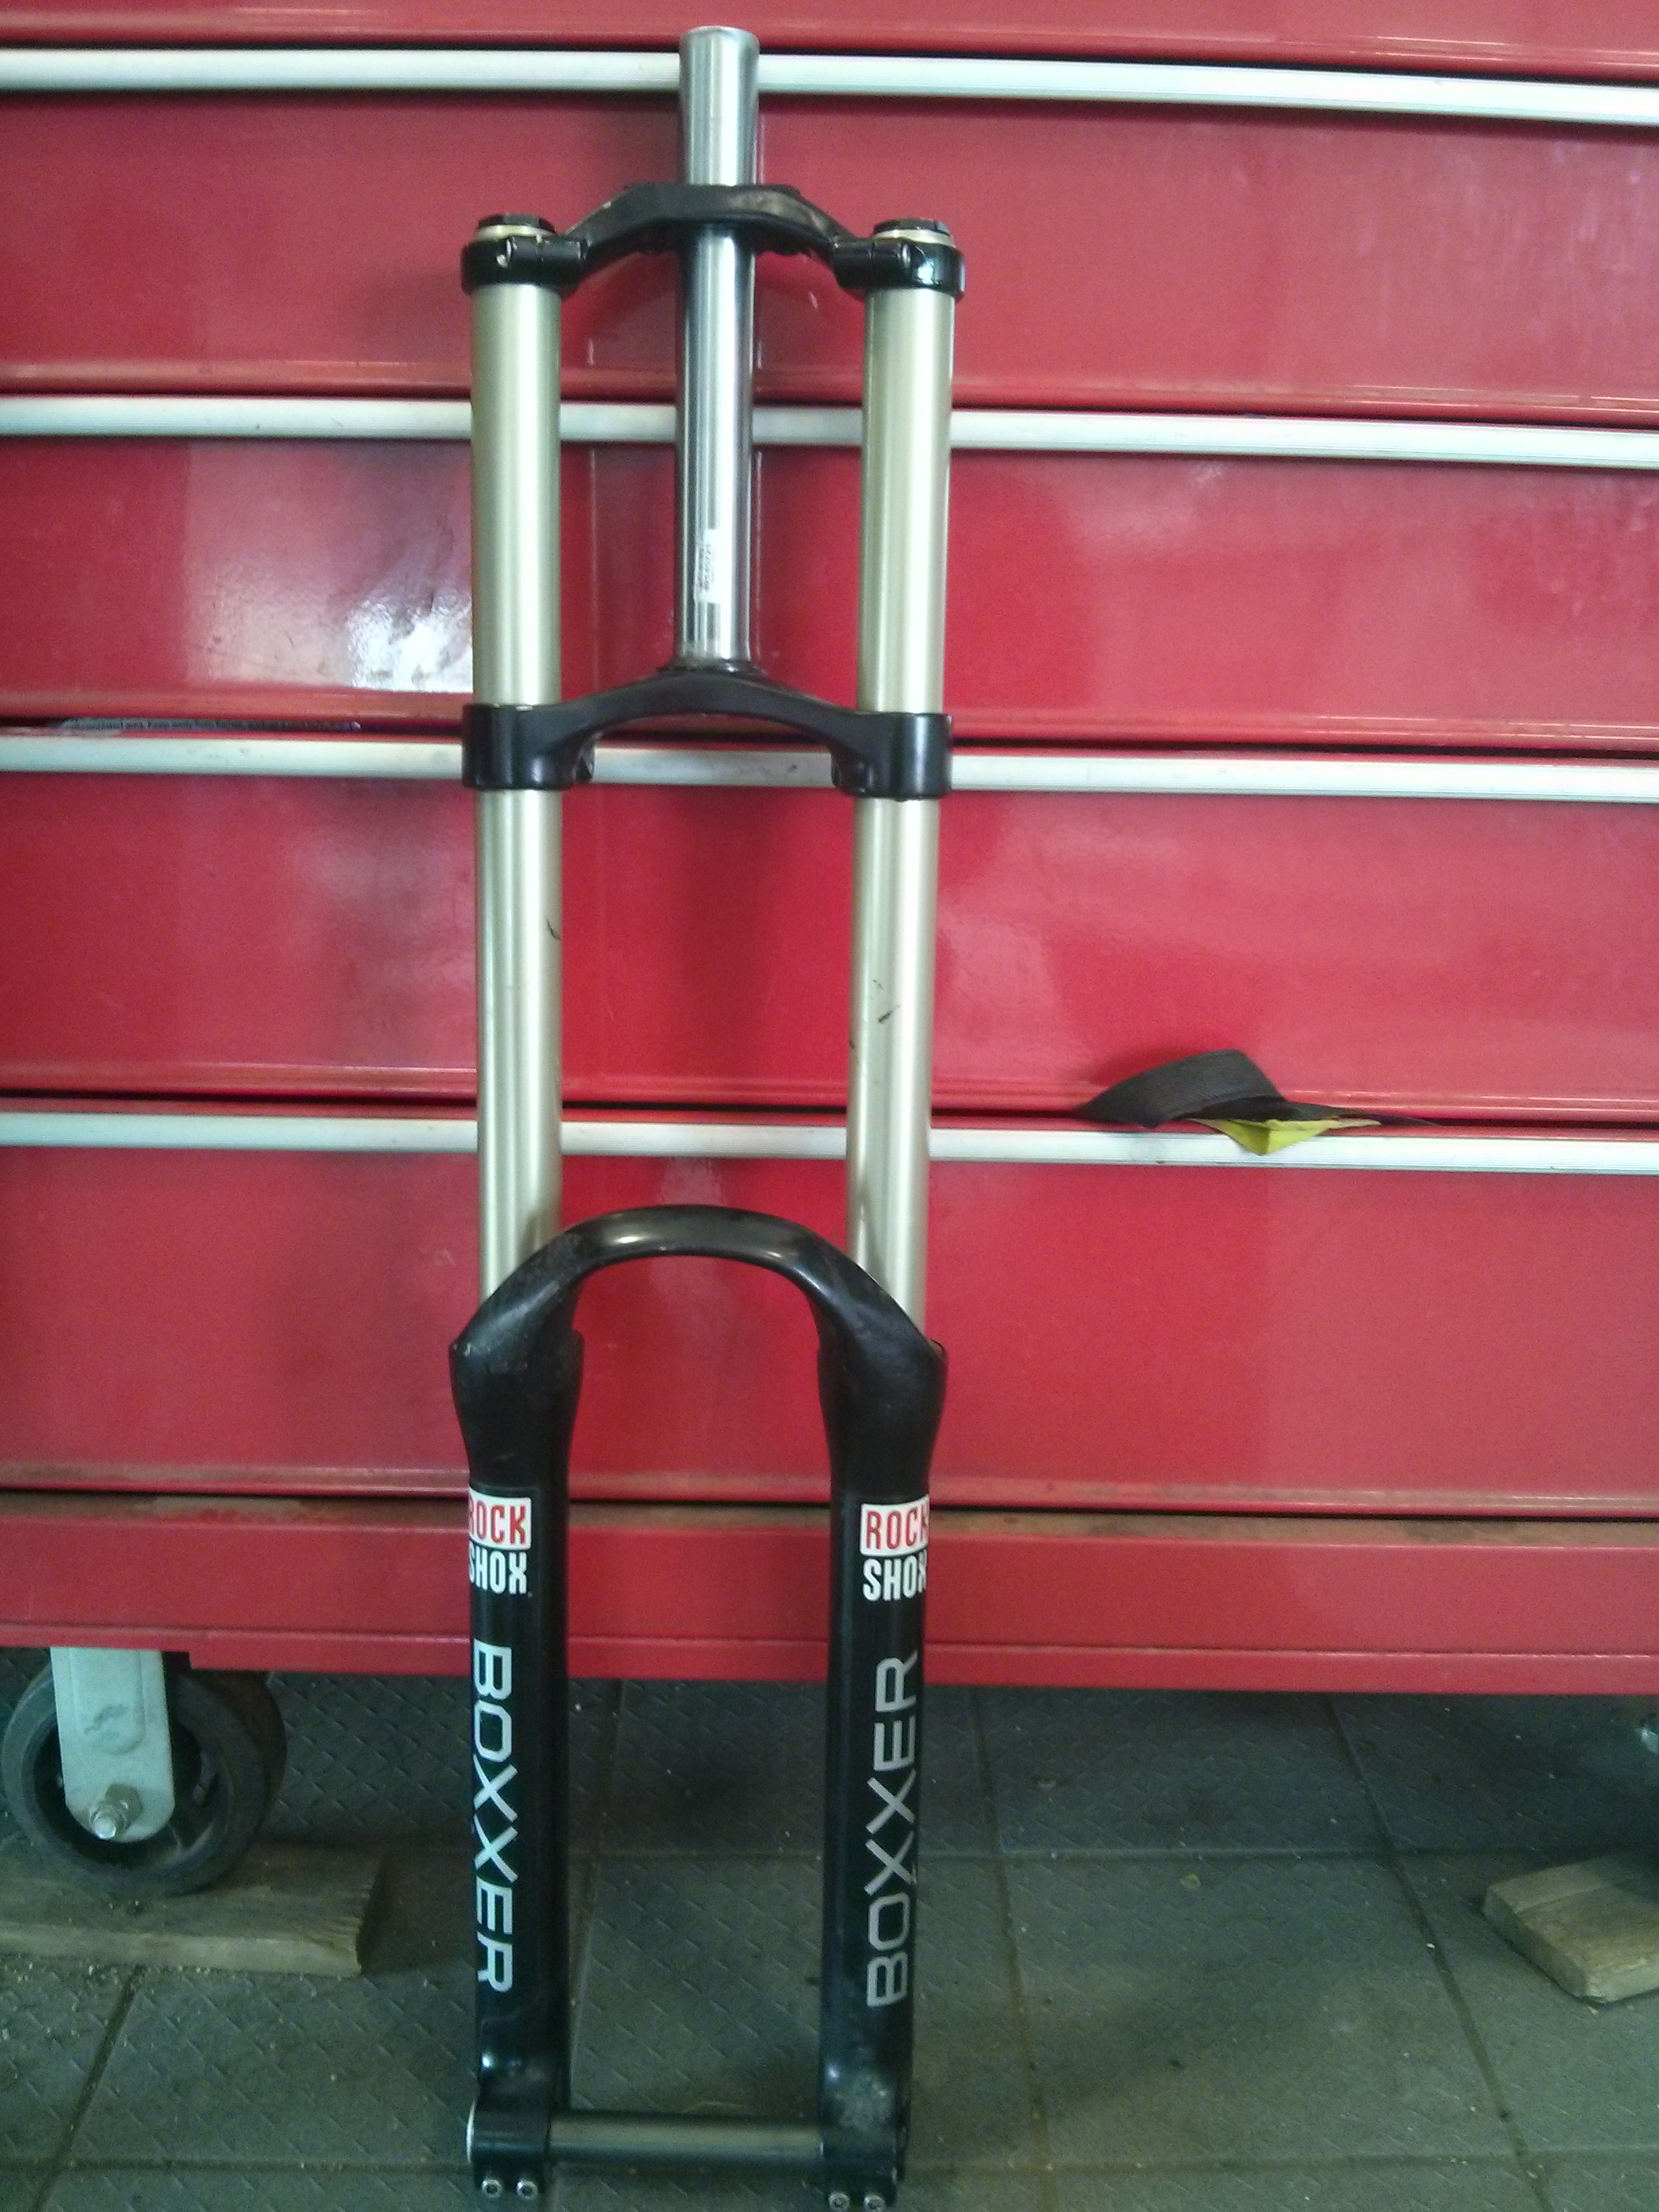 05 Rock Shox Boxxer rebuild | Ridemonkey Forums